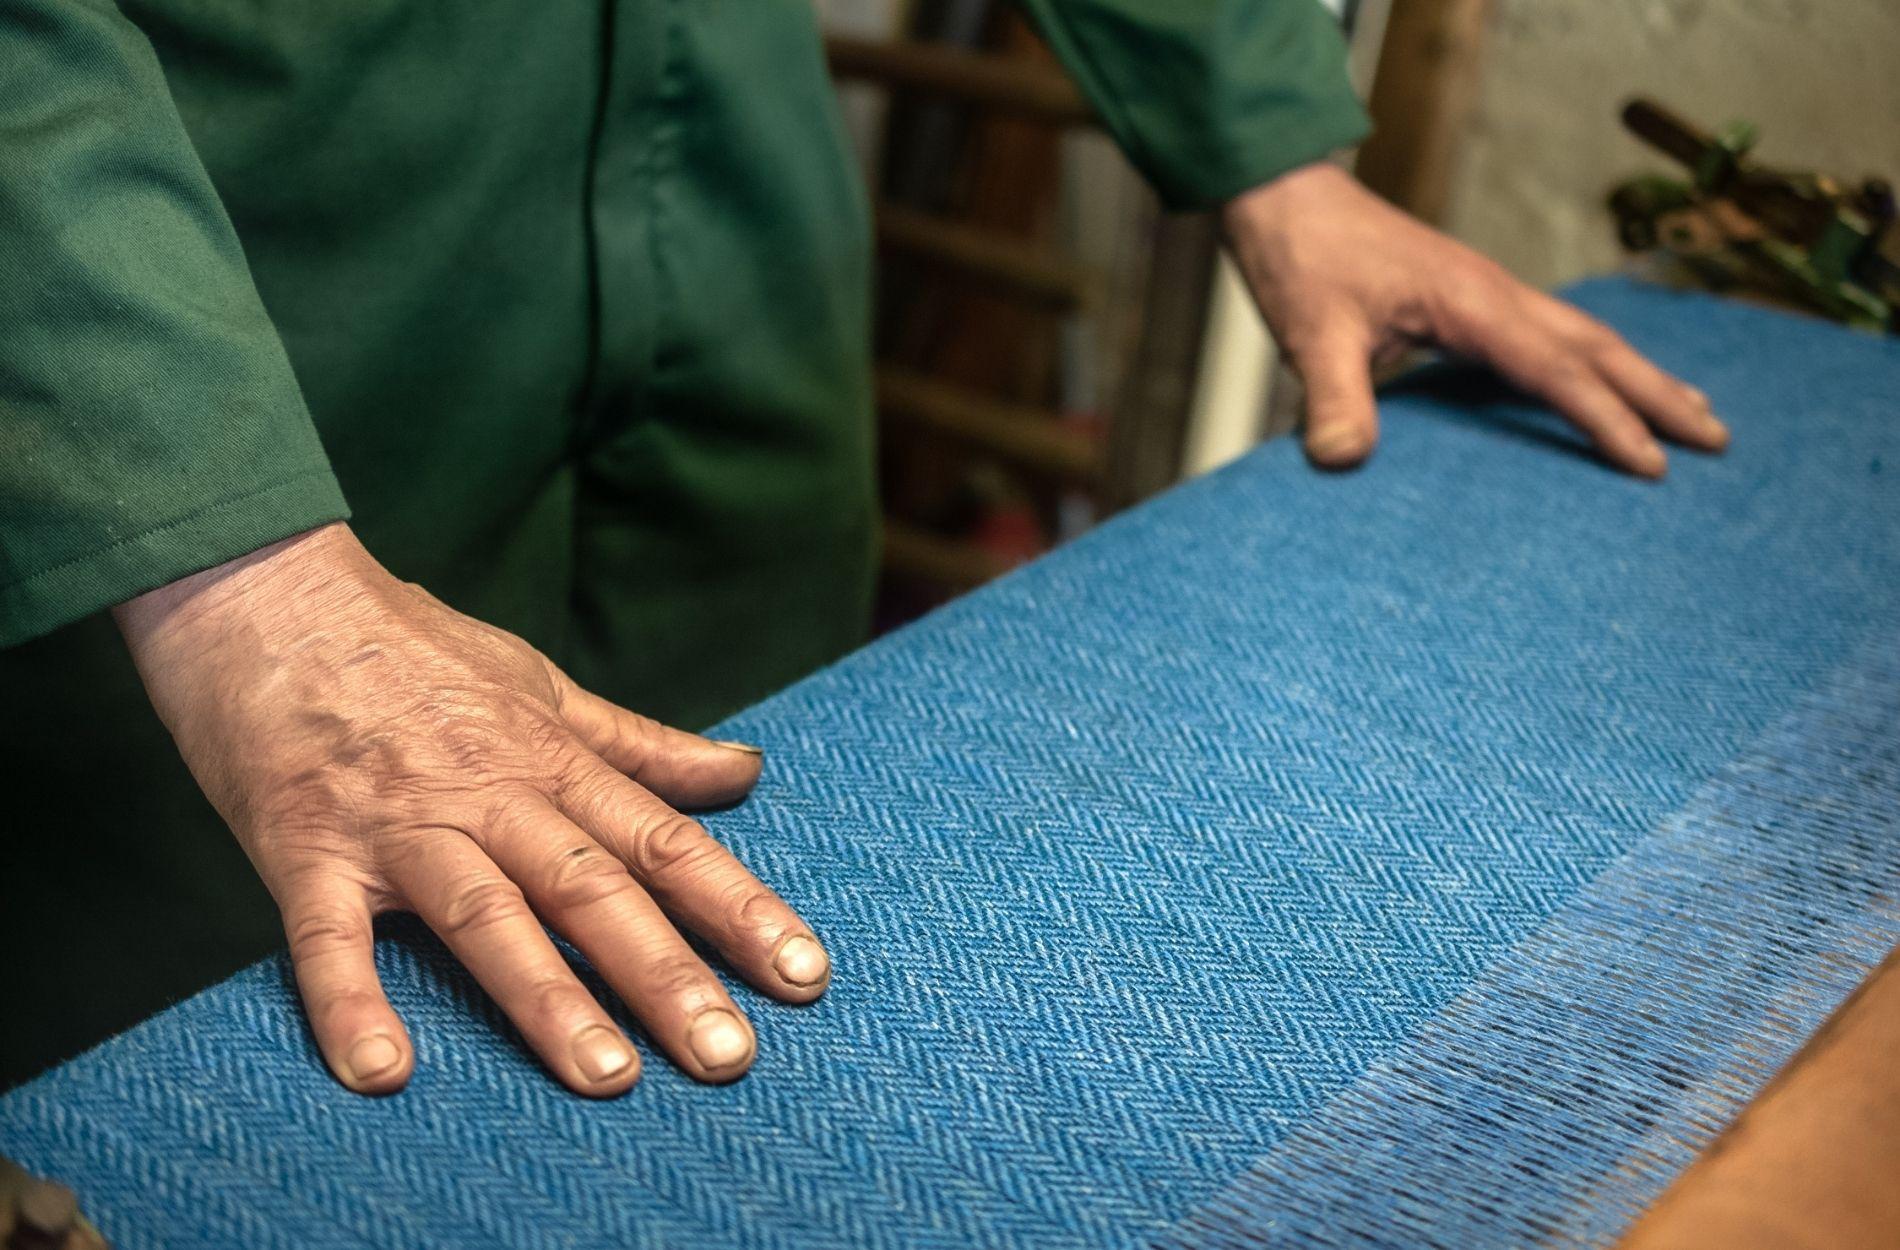 herring bone tweed handwoven for liebre style